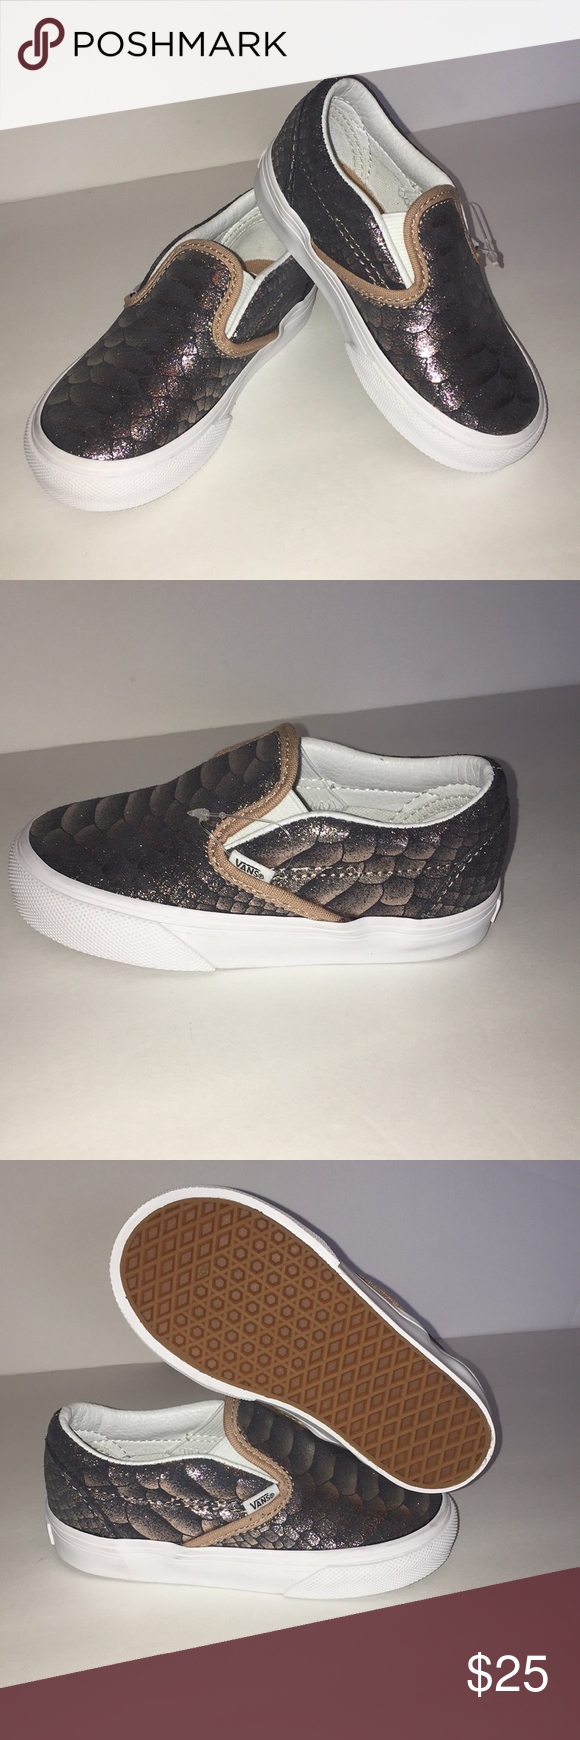 5d6d4c965e NWOT Vans Old Skool V (Mono Canvas) Brand new in box! Vans Old Skool V (Mono  Canvas) Apricot Ice Size 7.5 Toddler Vans Shoes Sneakers